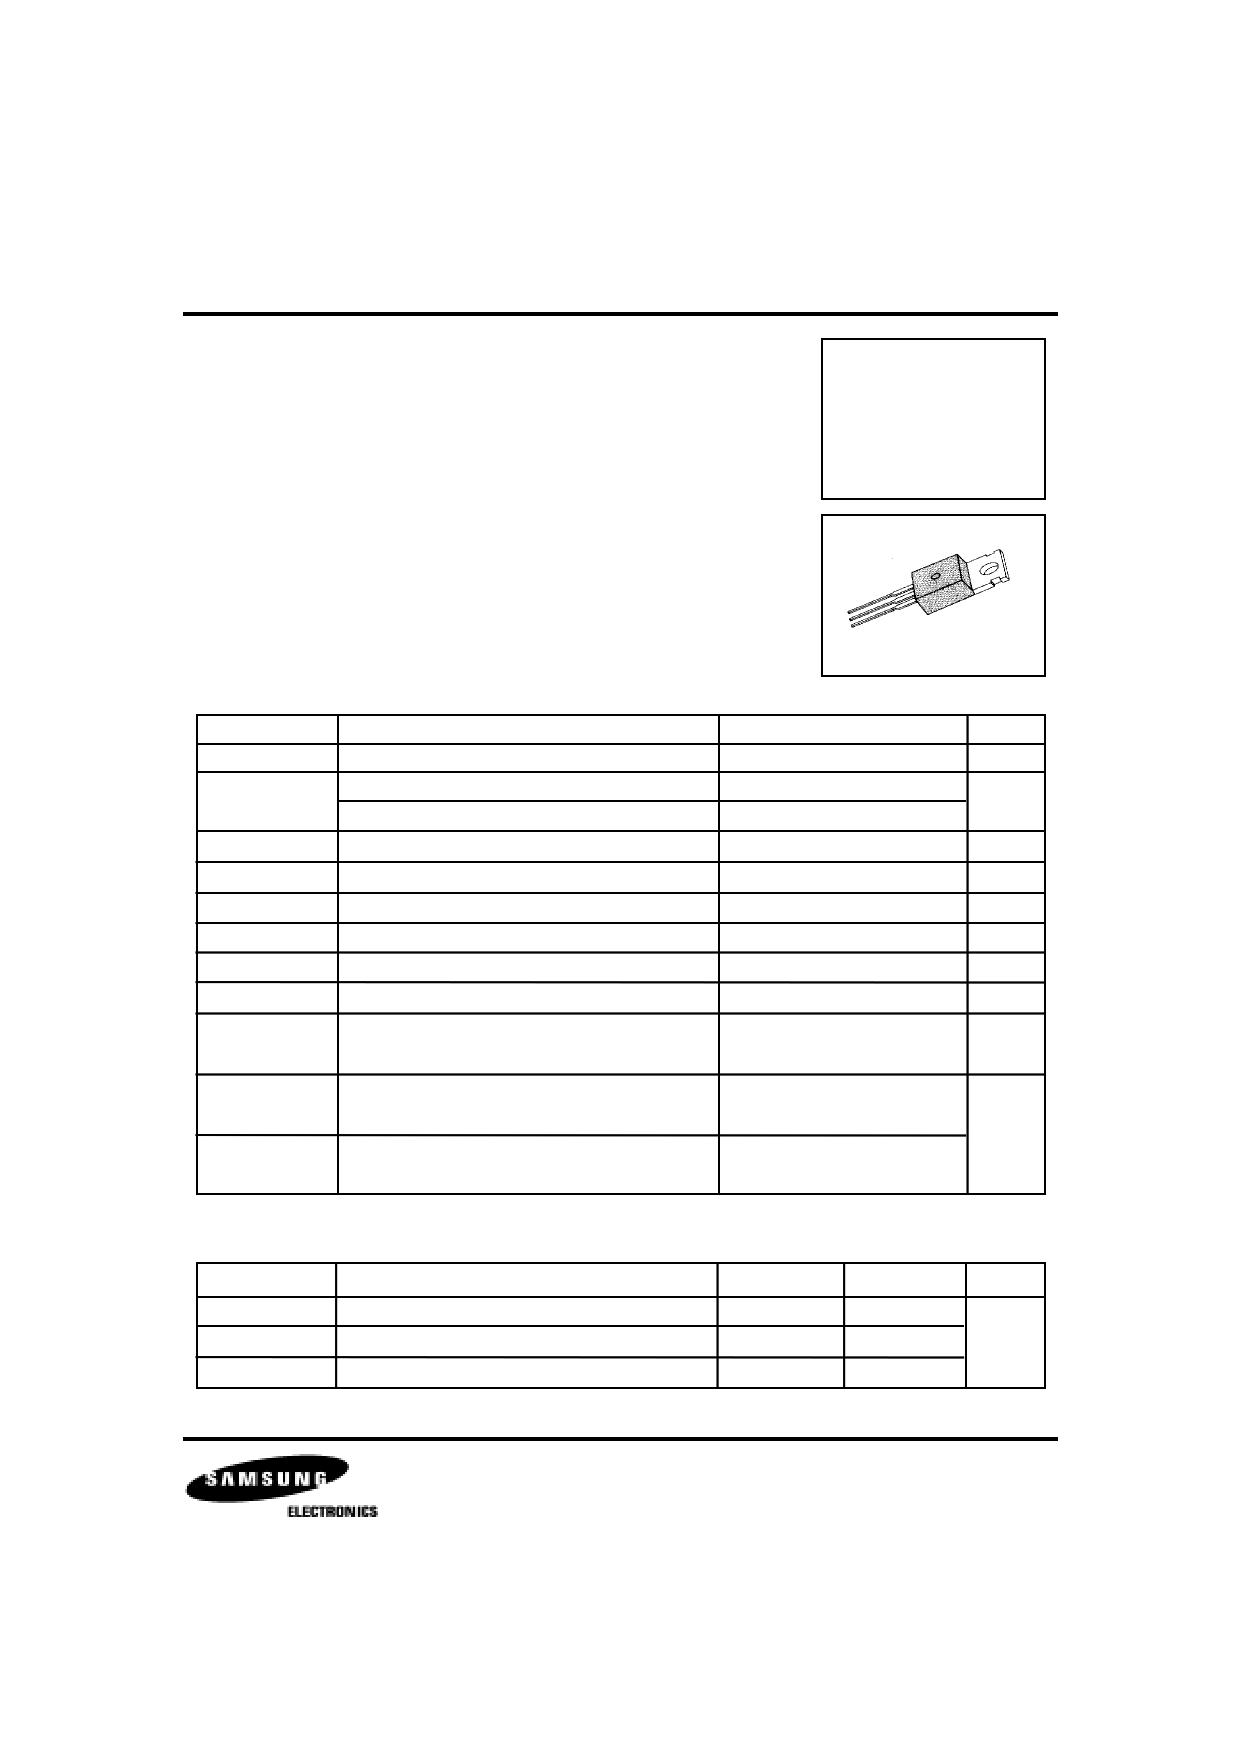 IRFZ44A Datasheet, IRFZ44A PDF,ピン配置, 機能